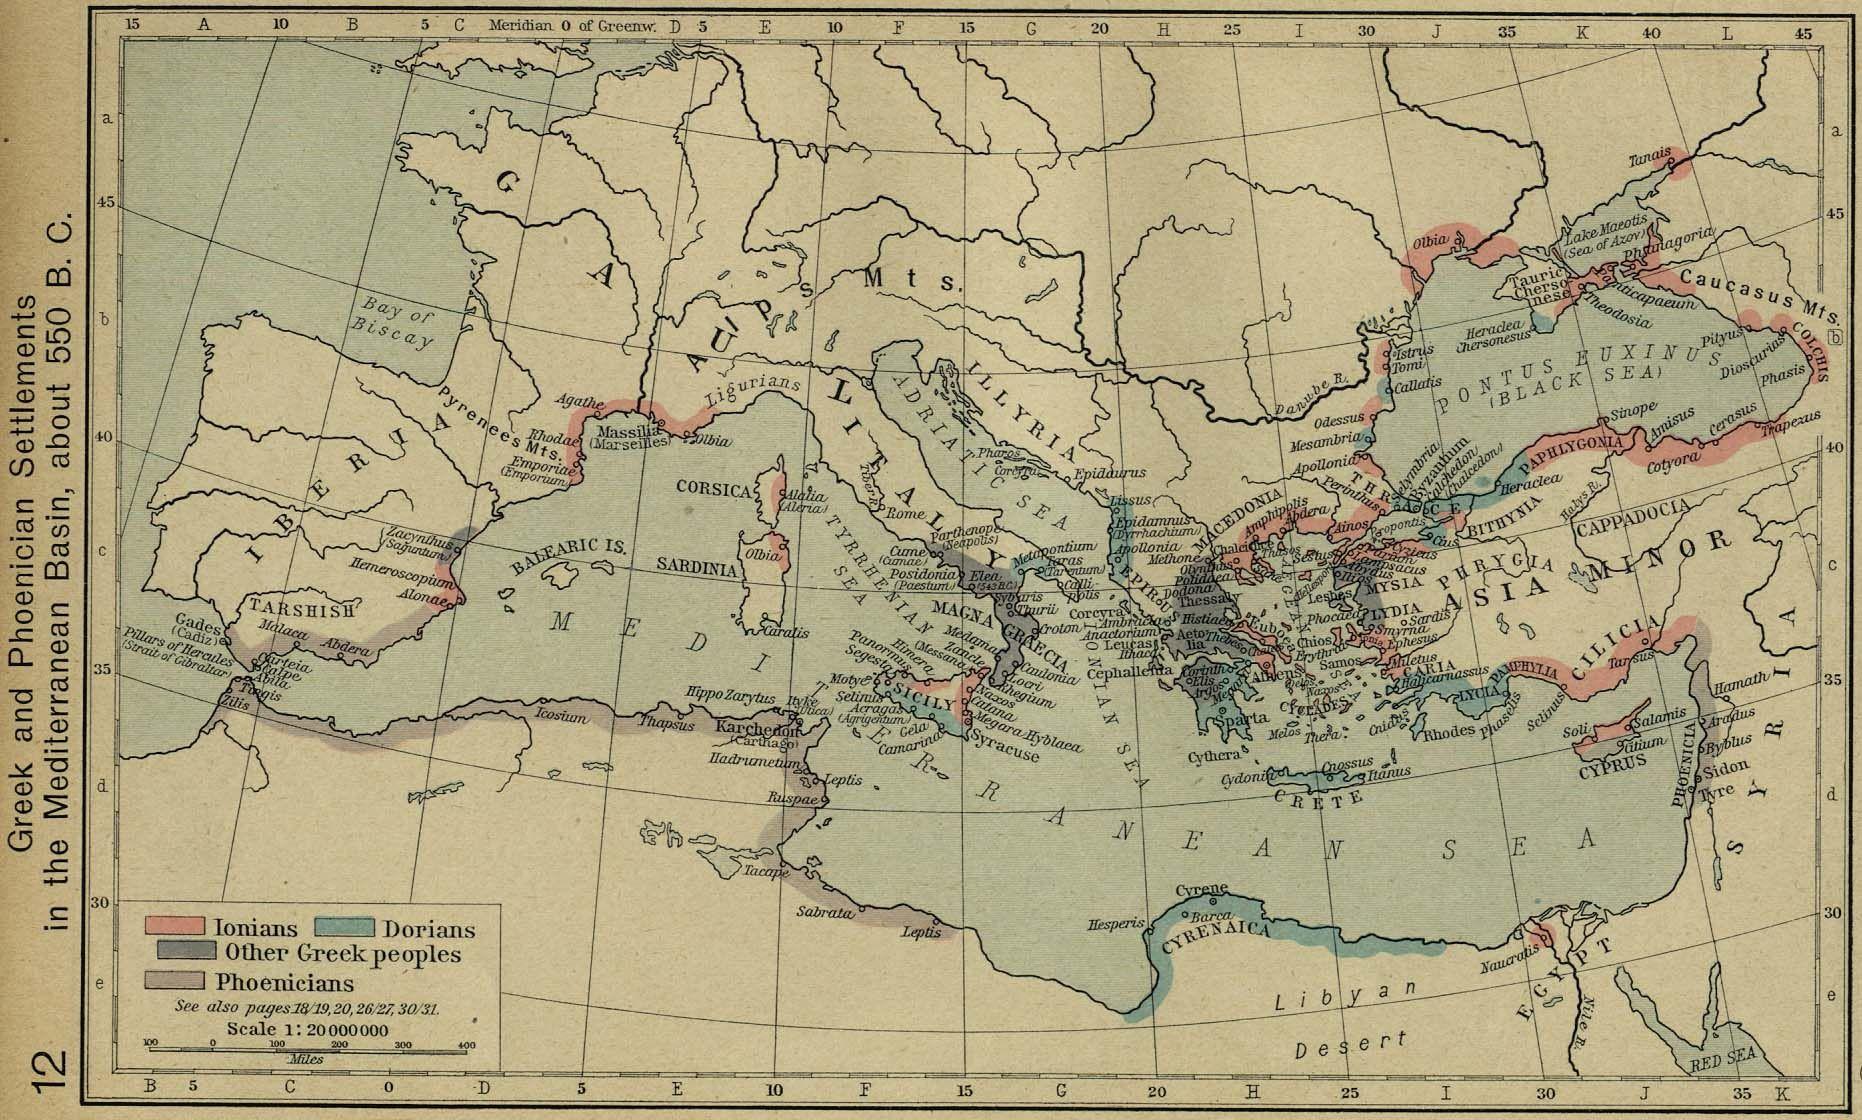 Map of the mediterranean sea 550 bc cartografa pinterest 8d1d1ff54af6cad1896e19302bd89d6bg gumiabroncs Image collections